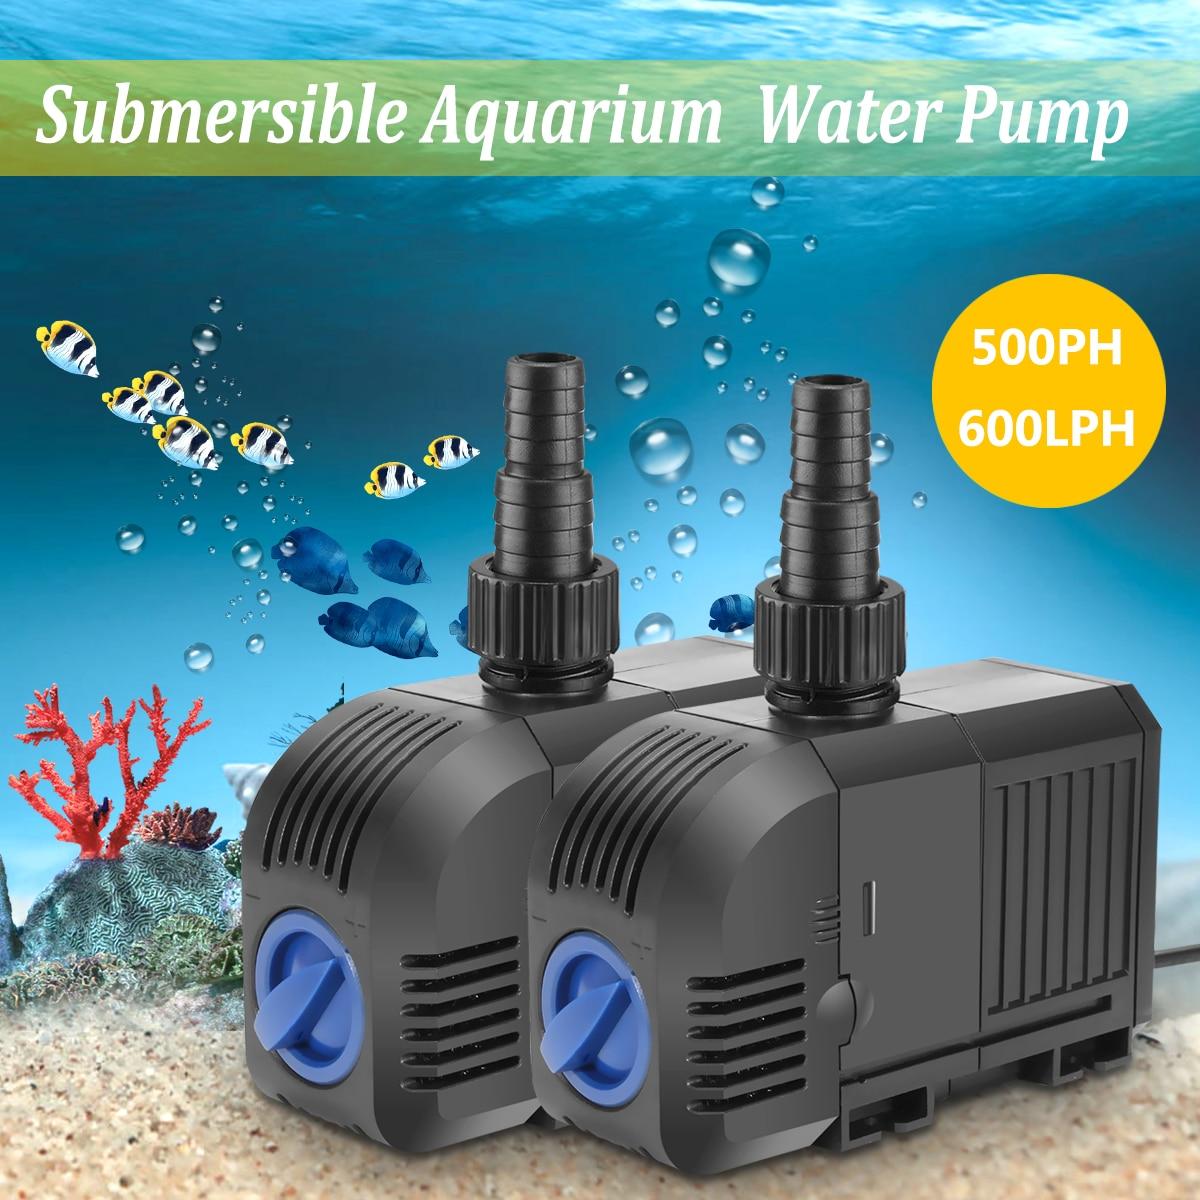 Adjustable Changeable Water Pump for Aquarium Fish Tank Coral Reef Marine Aquarium Pump Sponges Submersible Pump for Pond Pool